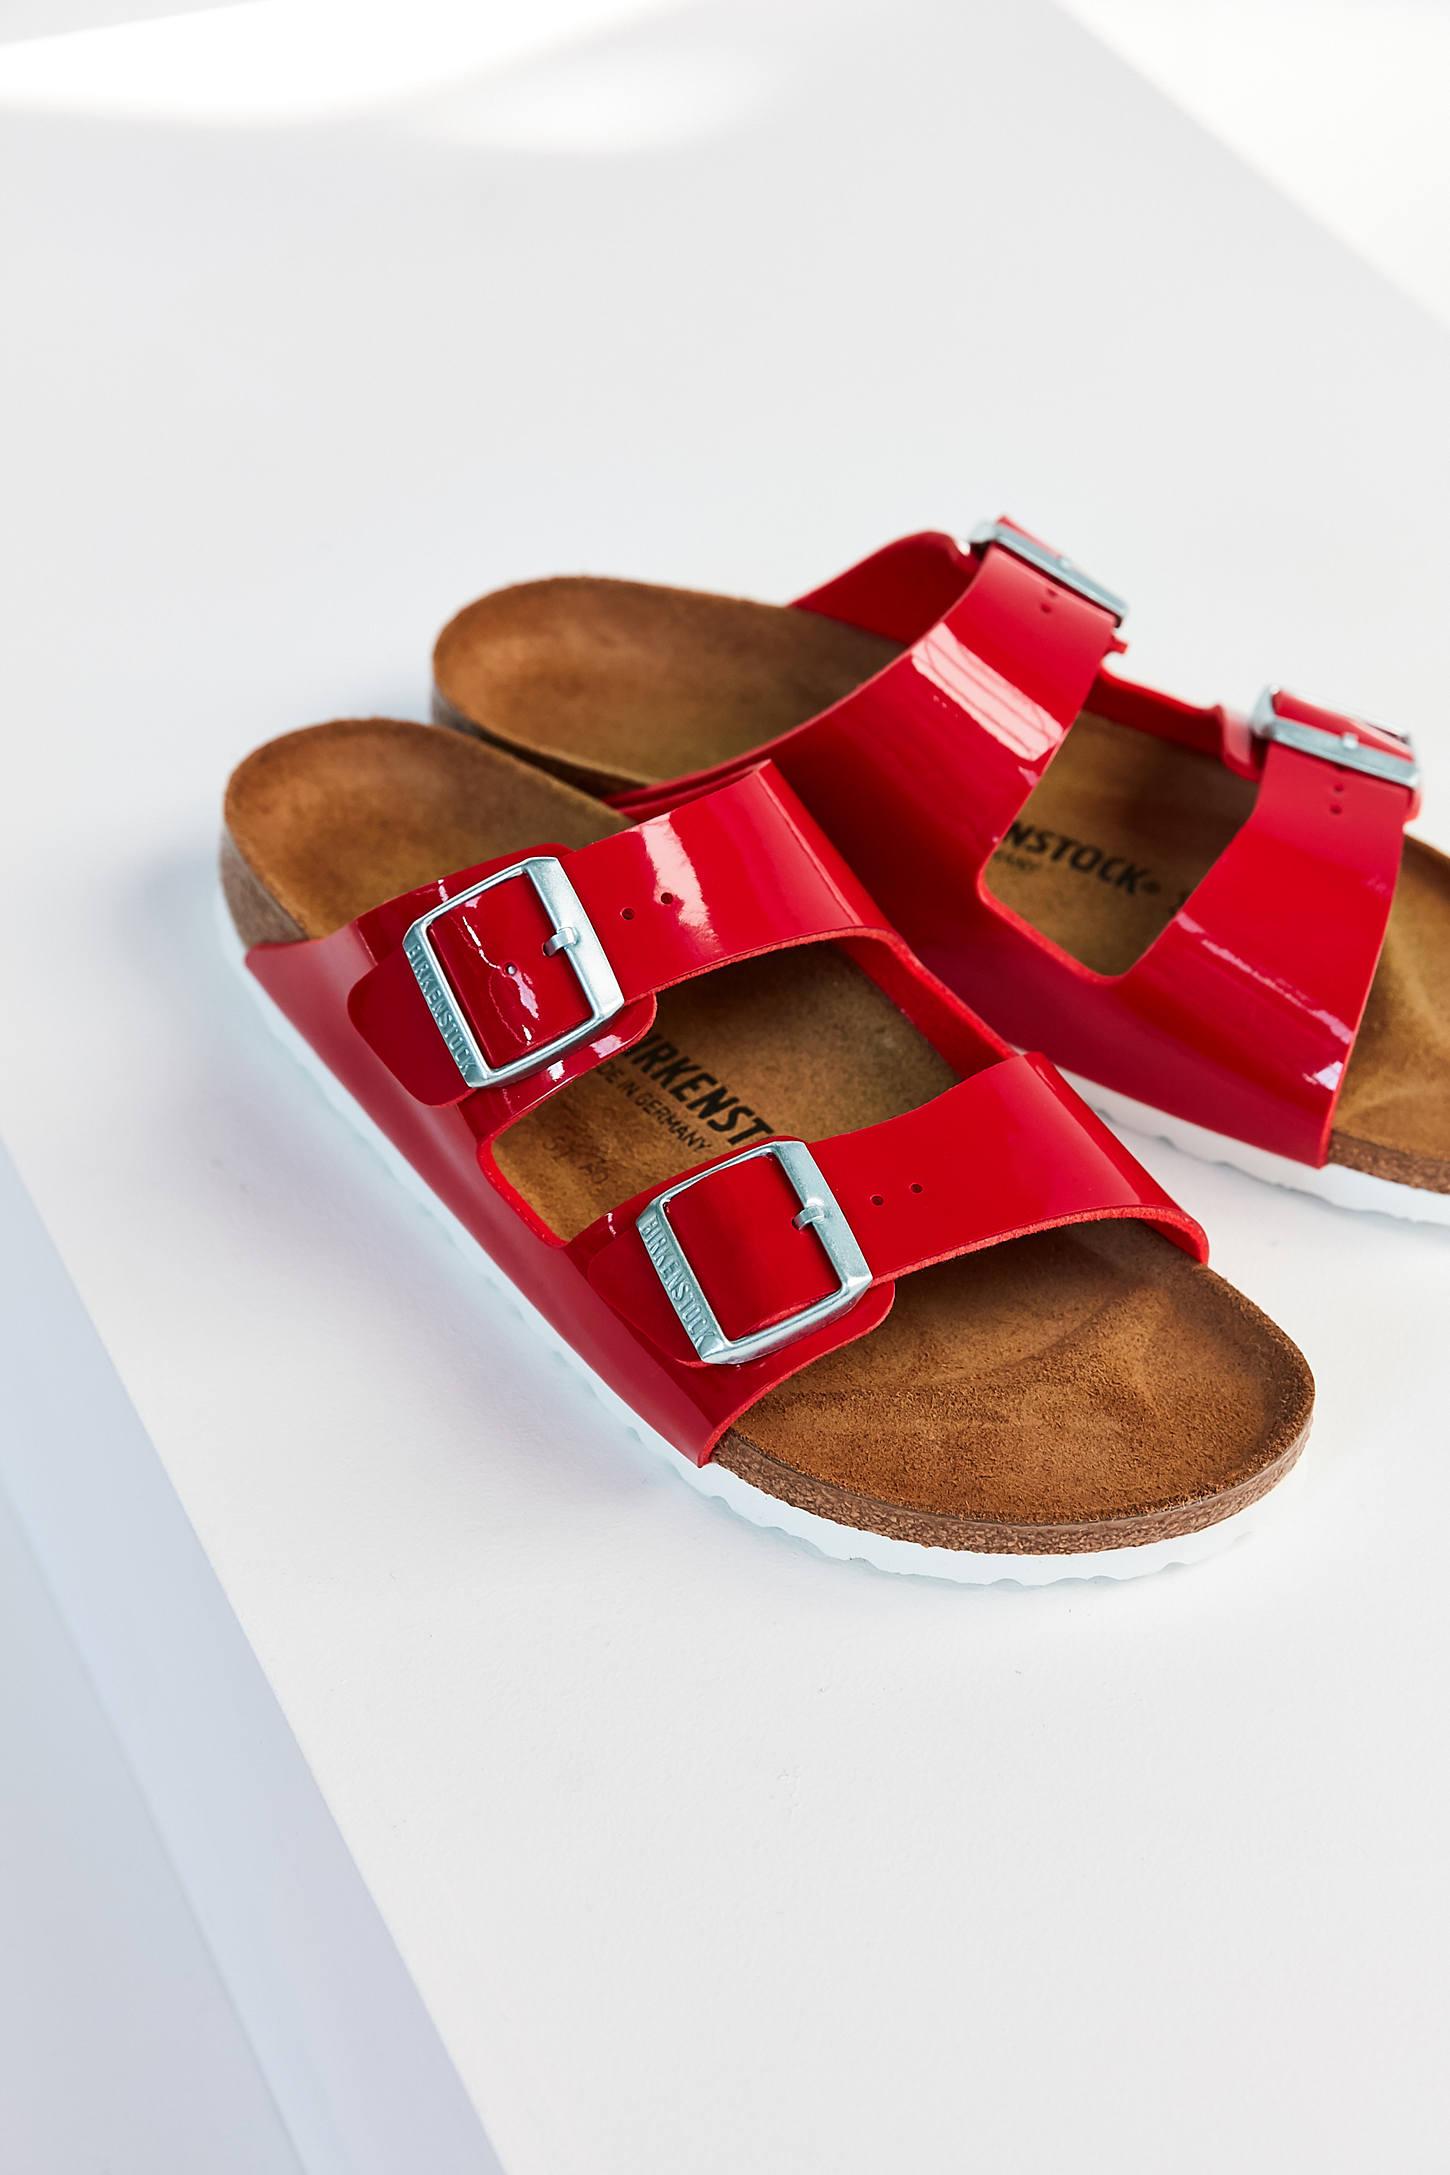 8ba1b7111a9 Discount Silver Birkenstock Mayari Sandals Sale